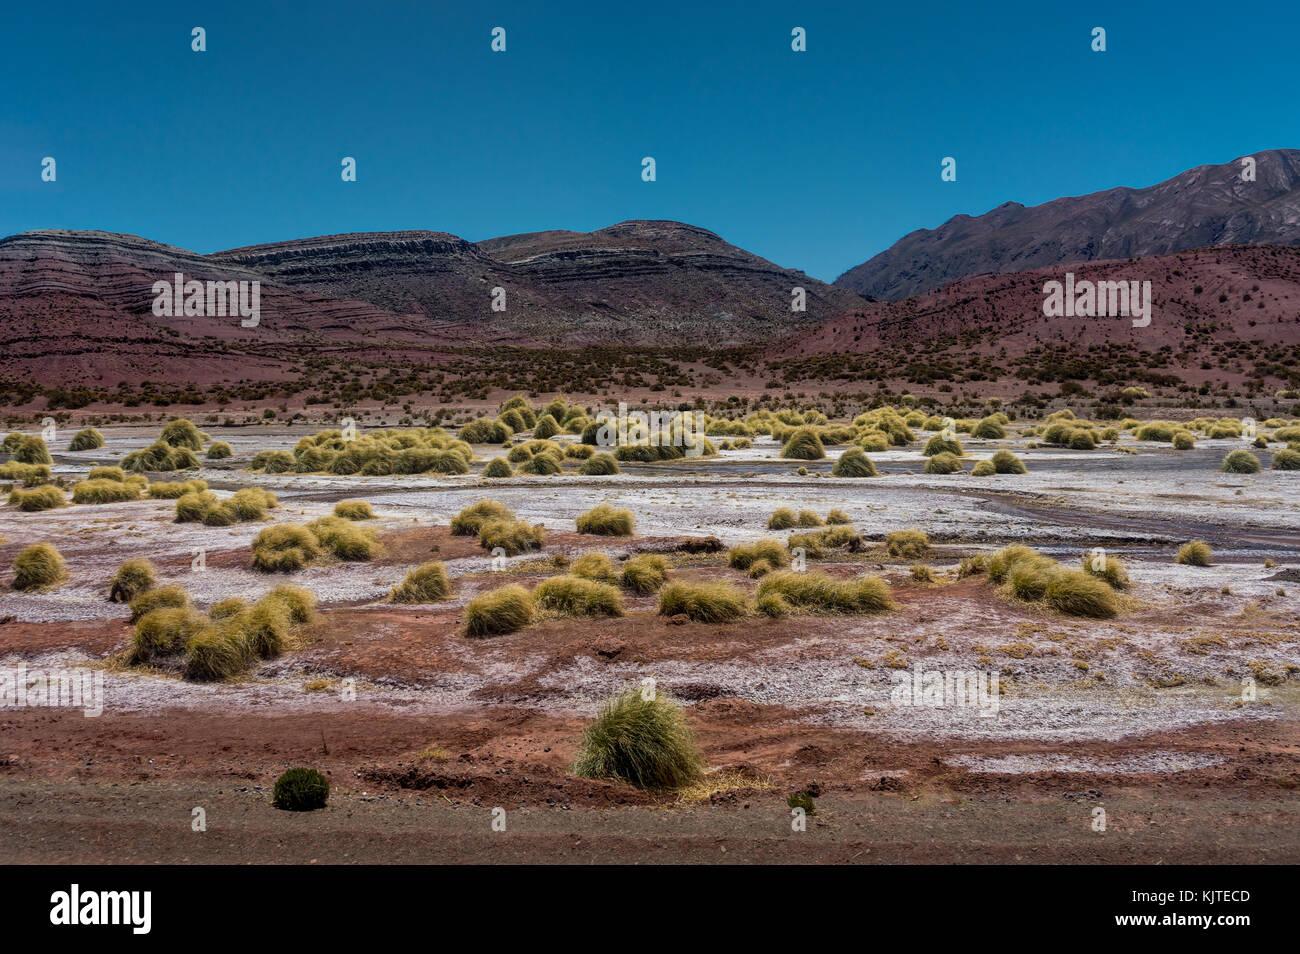 Photo taken in August 2017 in Uyuni Bolivia, South America: Atacama Desert in Uyuni Bolivia - Stock Image